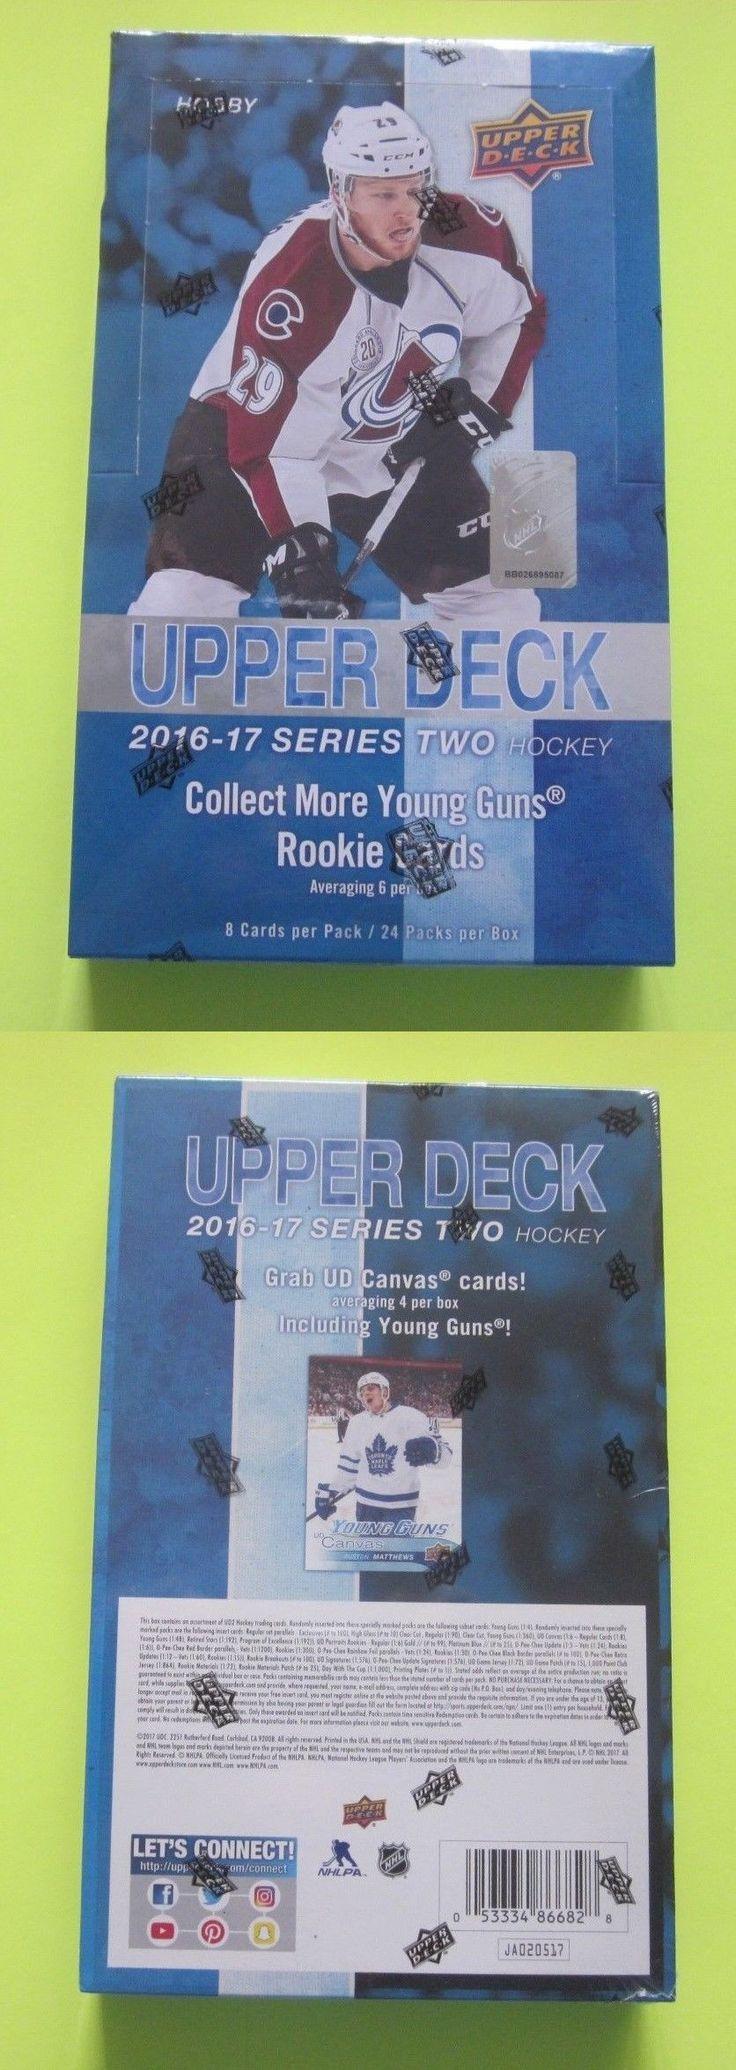 Ice Hockey Cards 216: 2016 17 Upper Deck Series 2 Hockey Hobby Box -> BUY IT NOW ONLY: $87.5 on eBay!